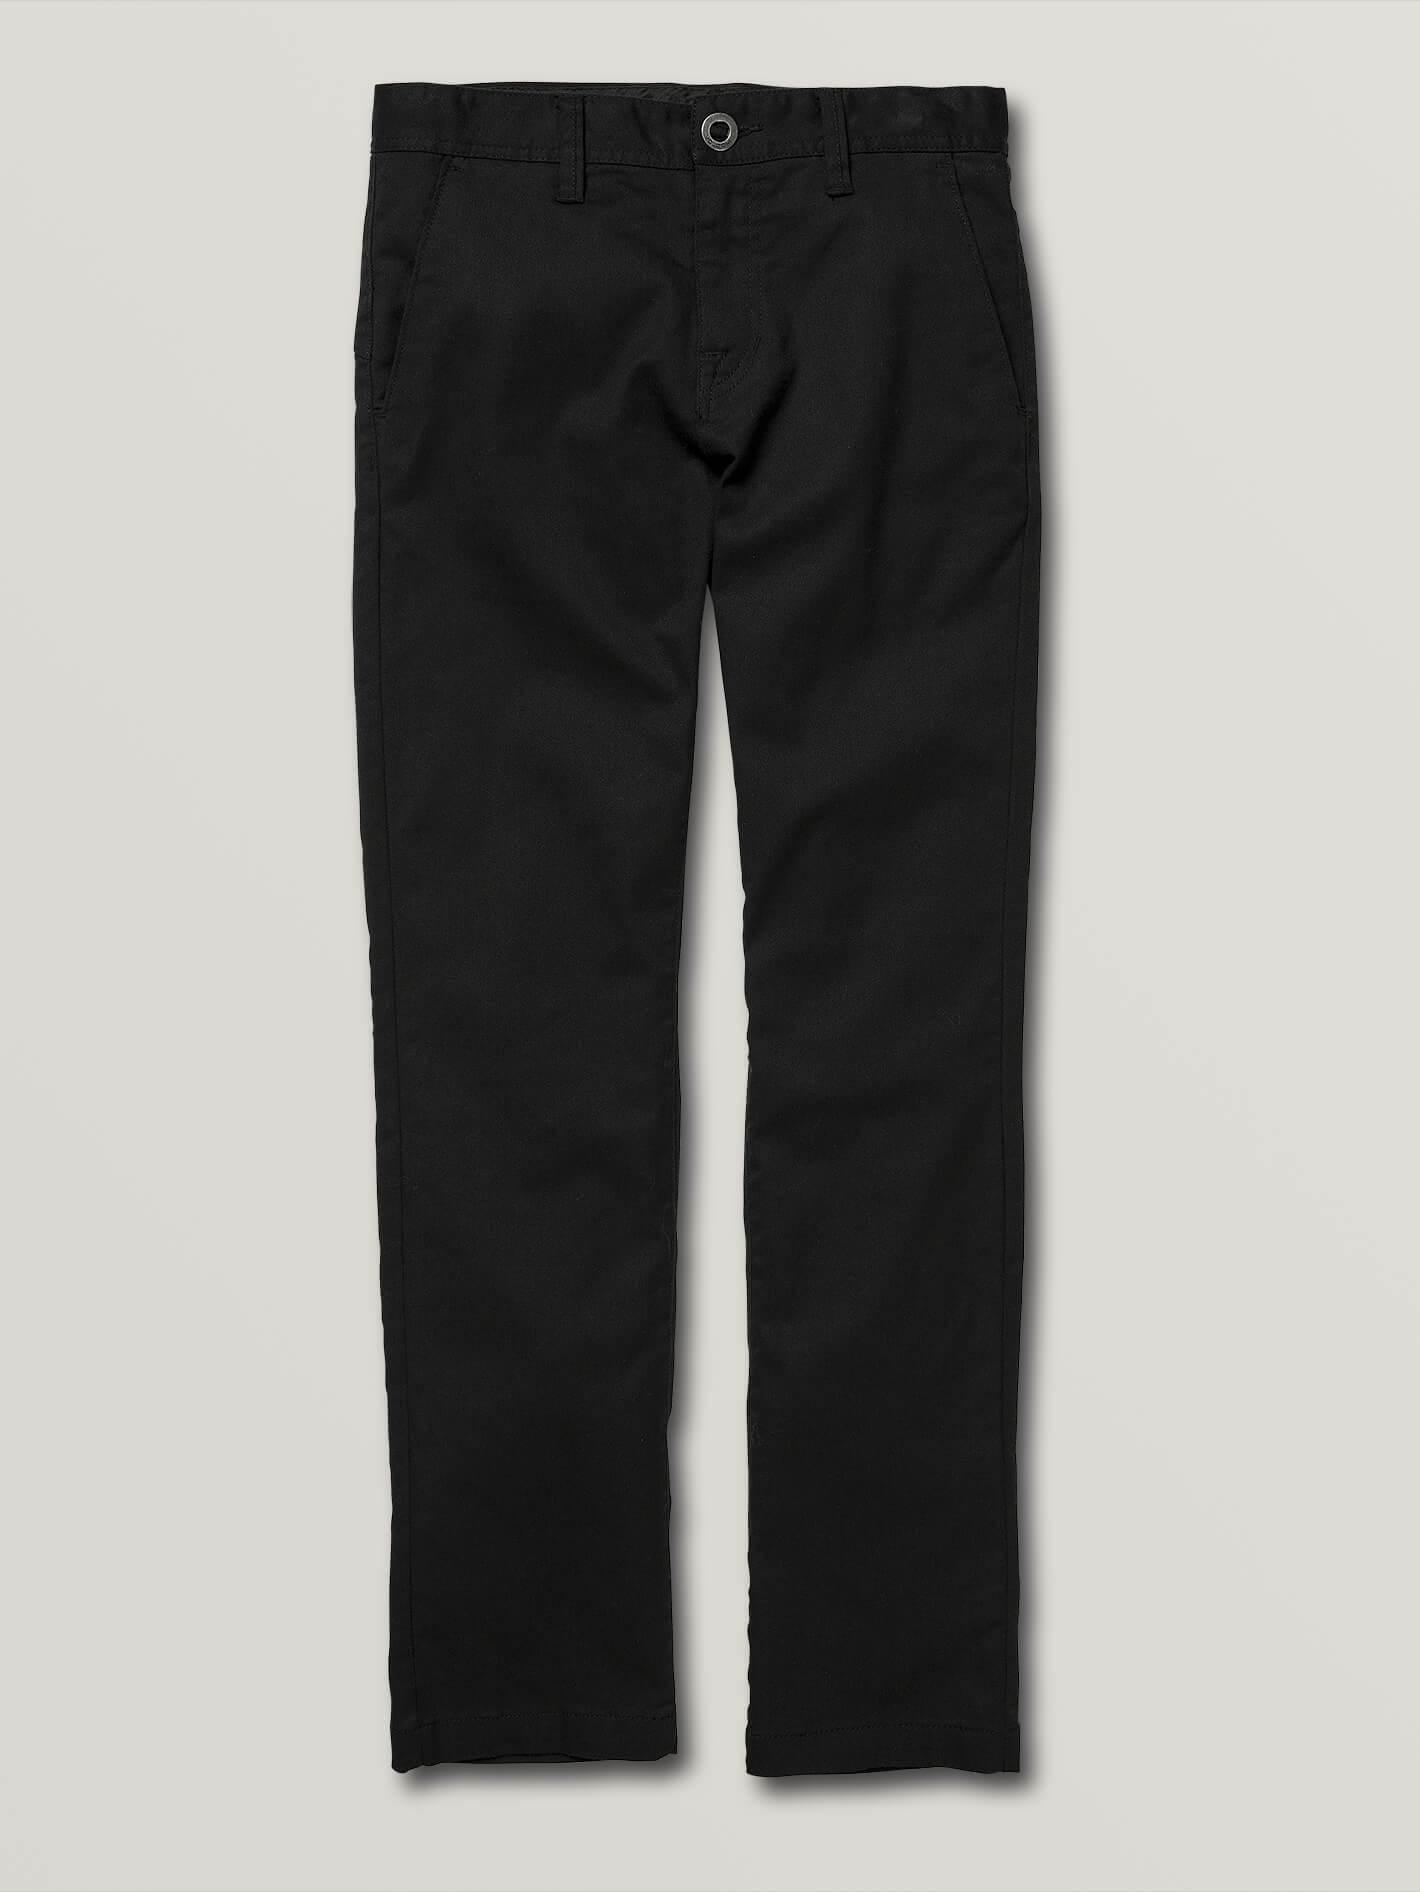 Big Boys Frickin Modern Stretch Chino Pants - Black - BLACK / 27